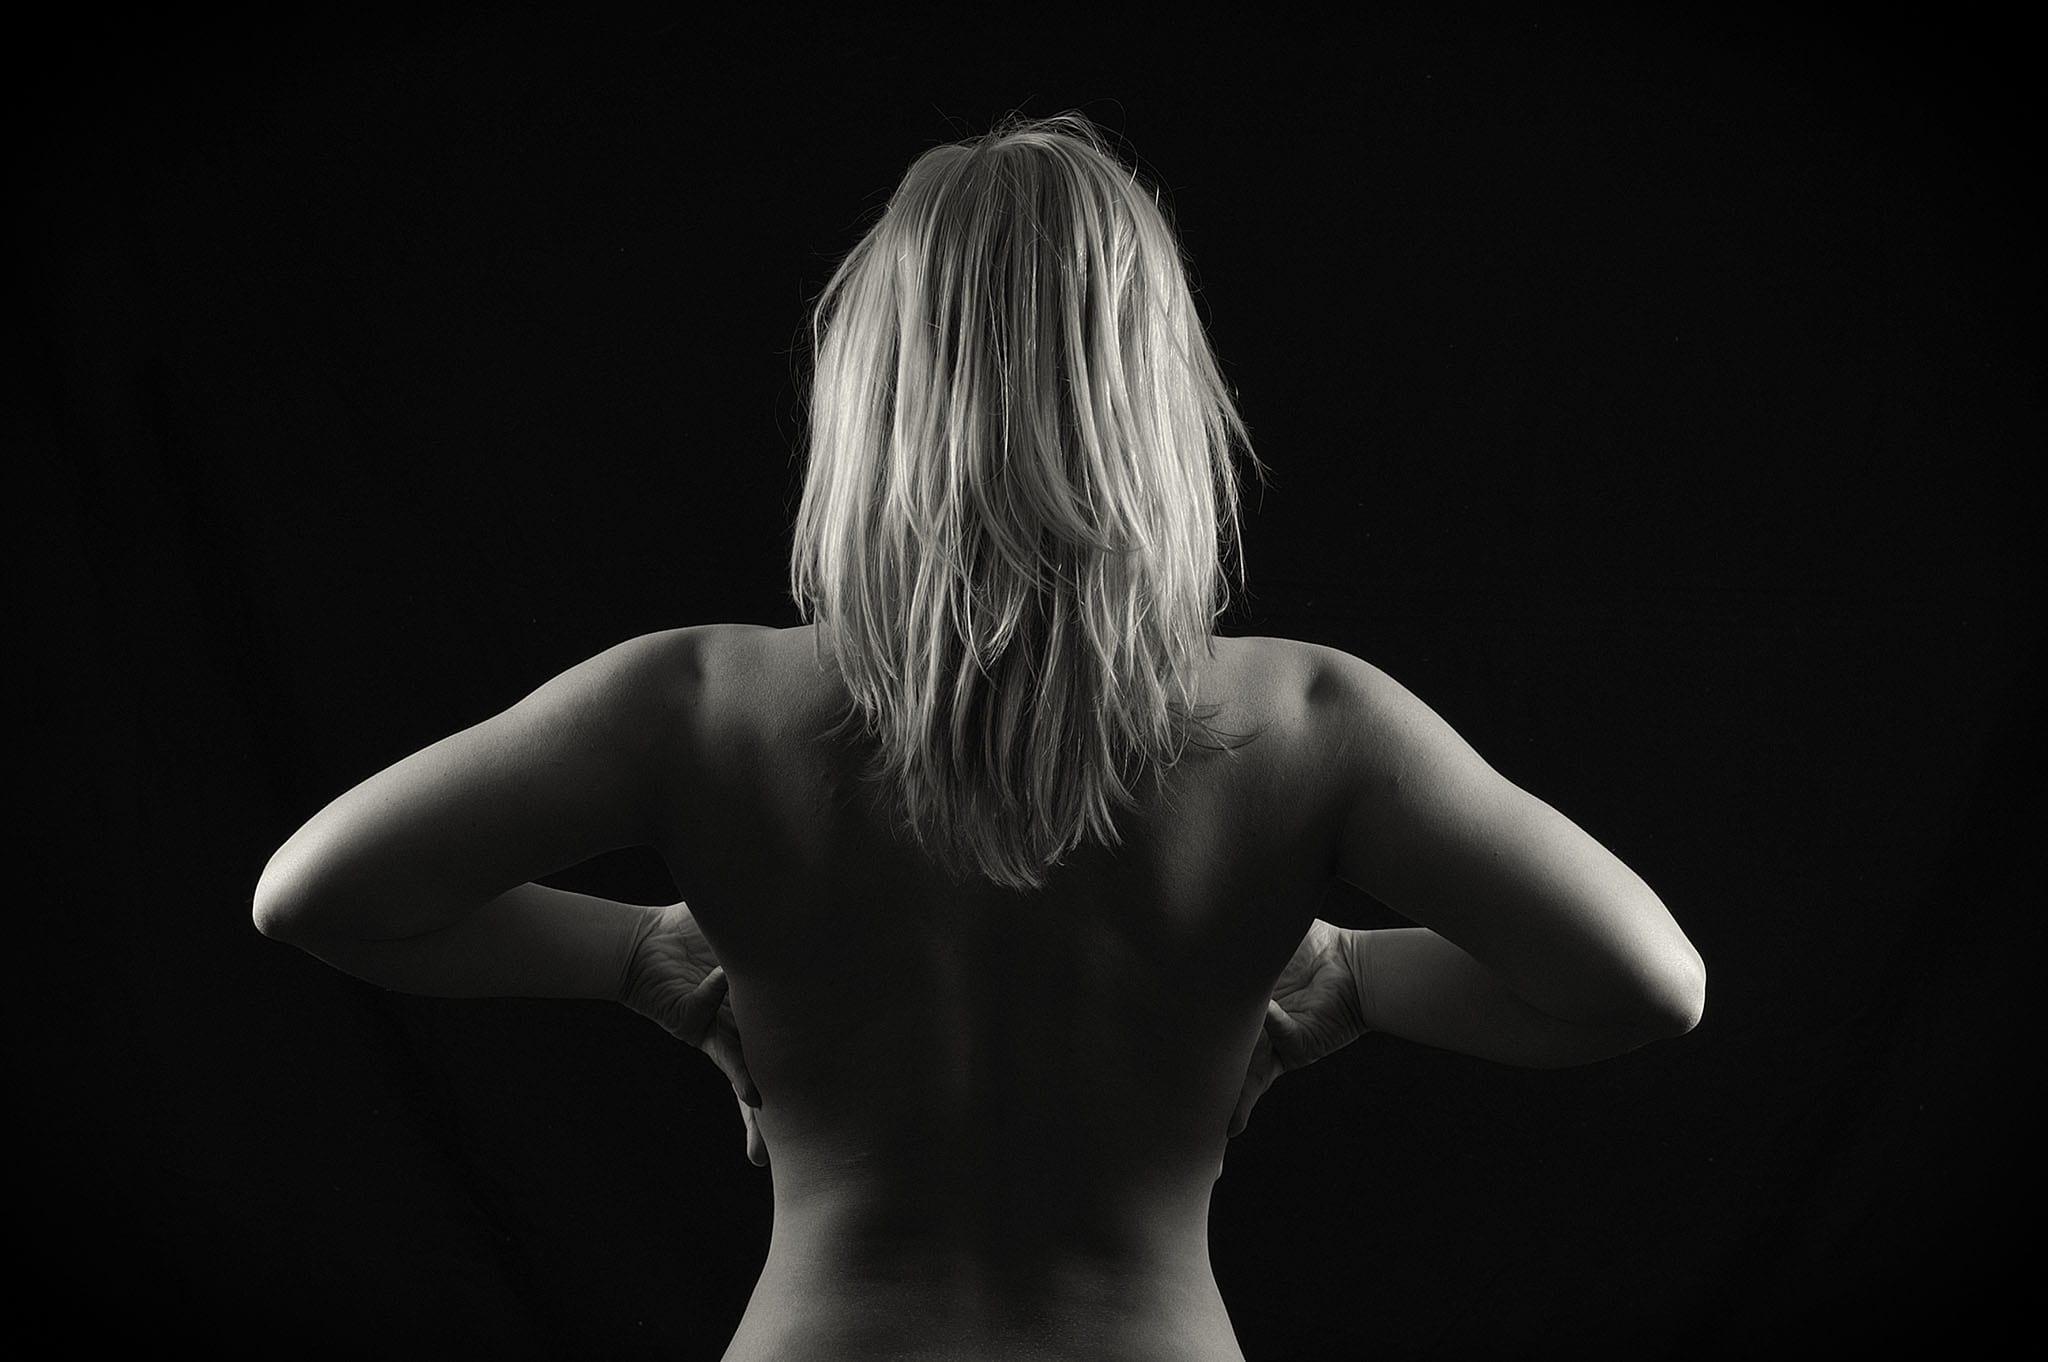 Akt 15 - Akt Nude Act Aktfotografie Erotik Erotic